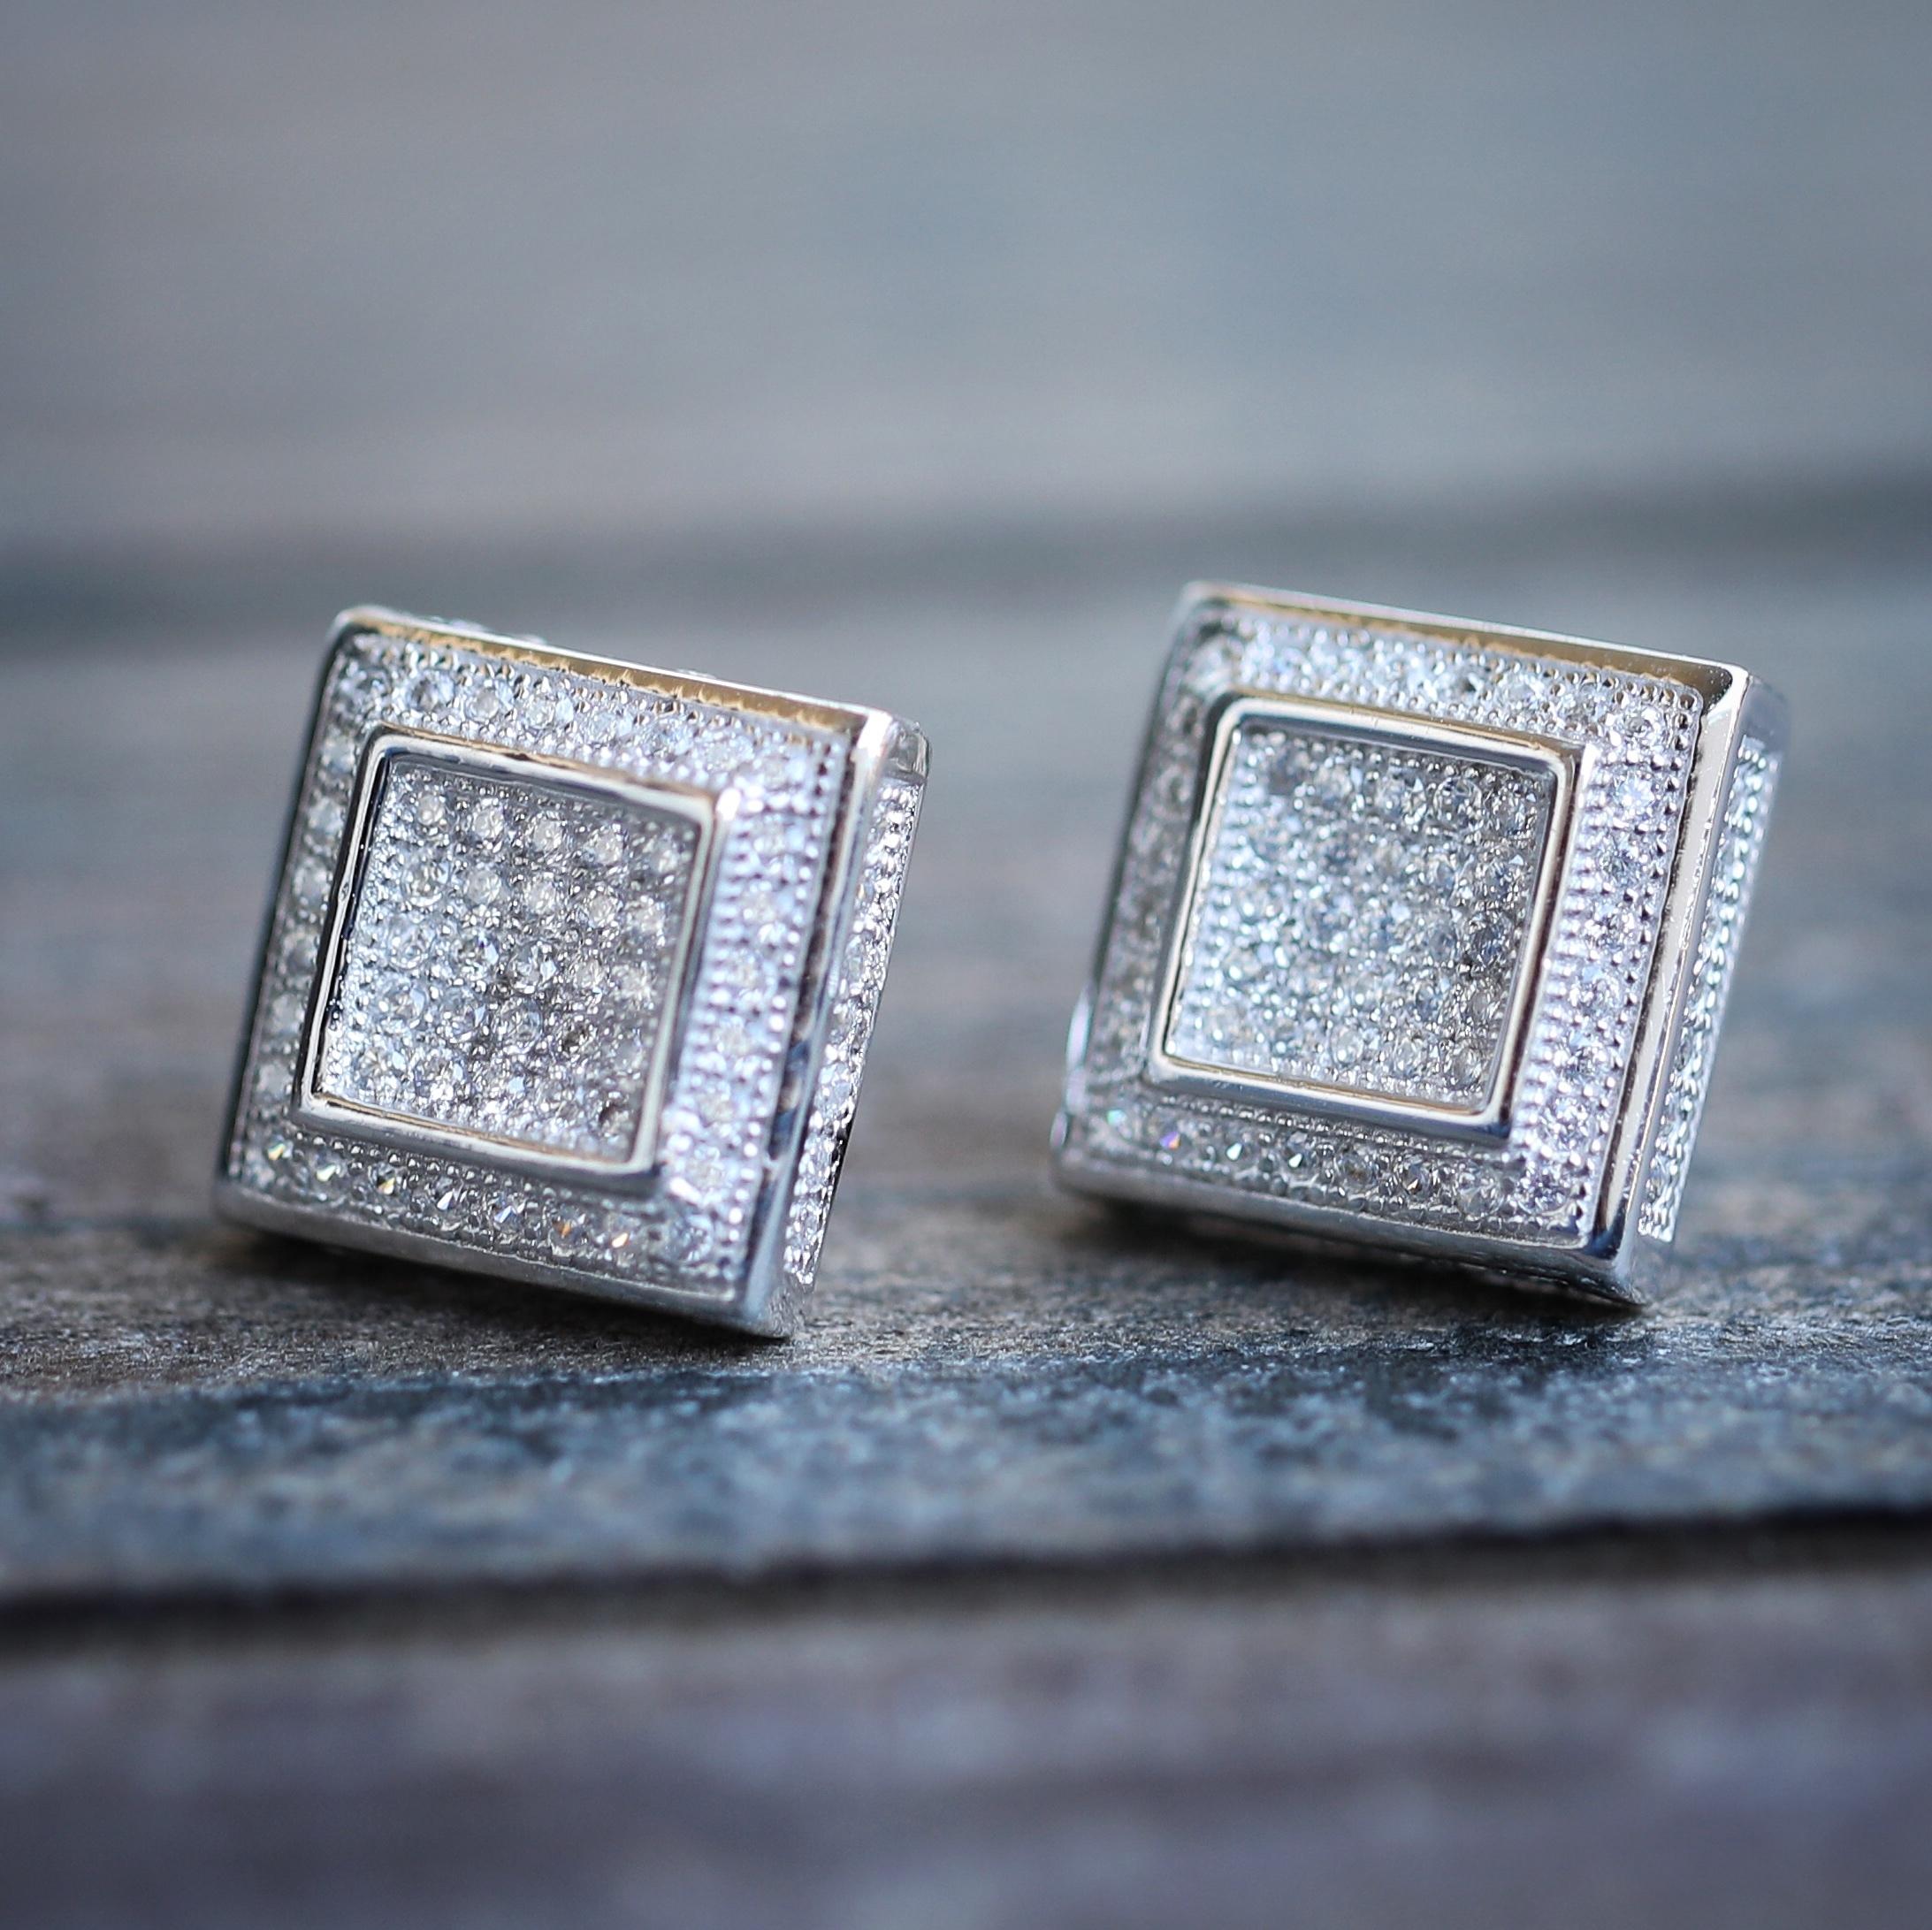 Mens Silver Square Diamond Stud Earrings